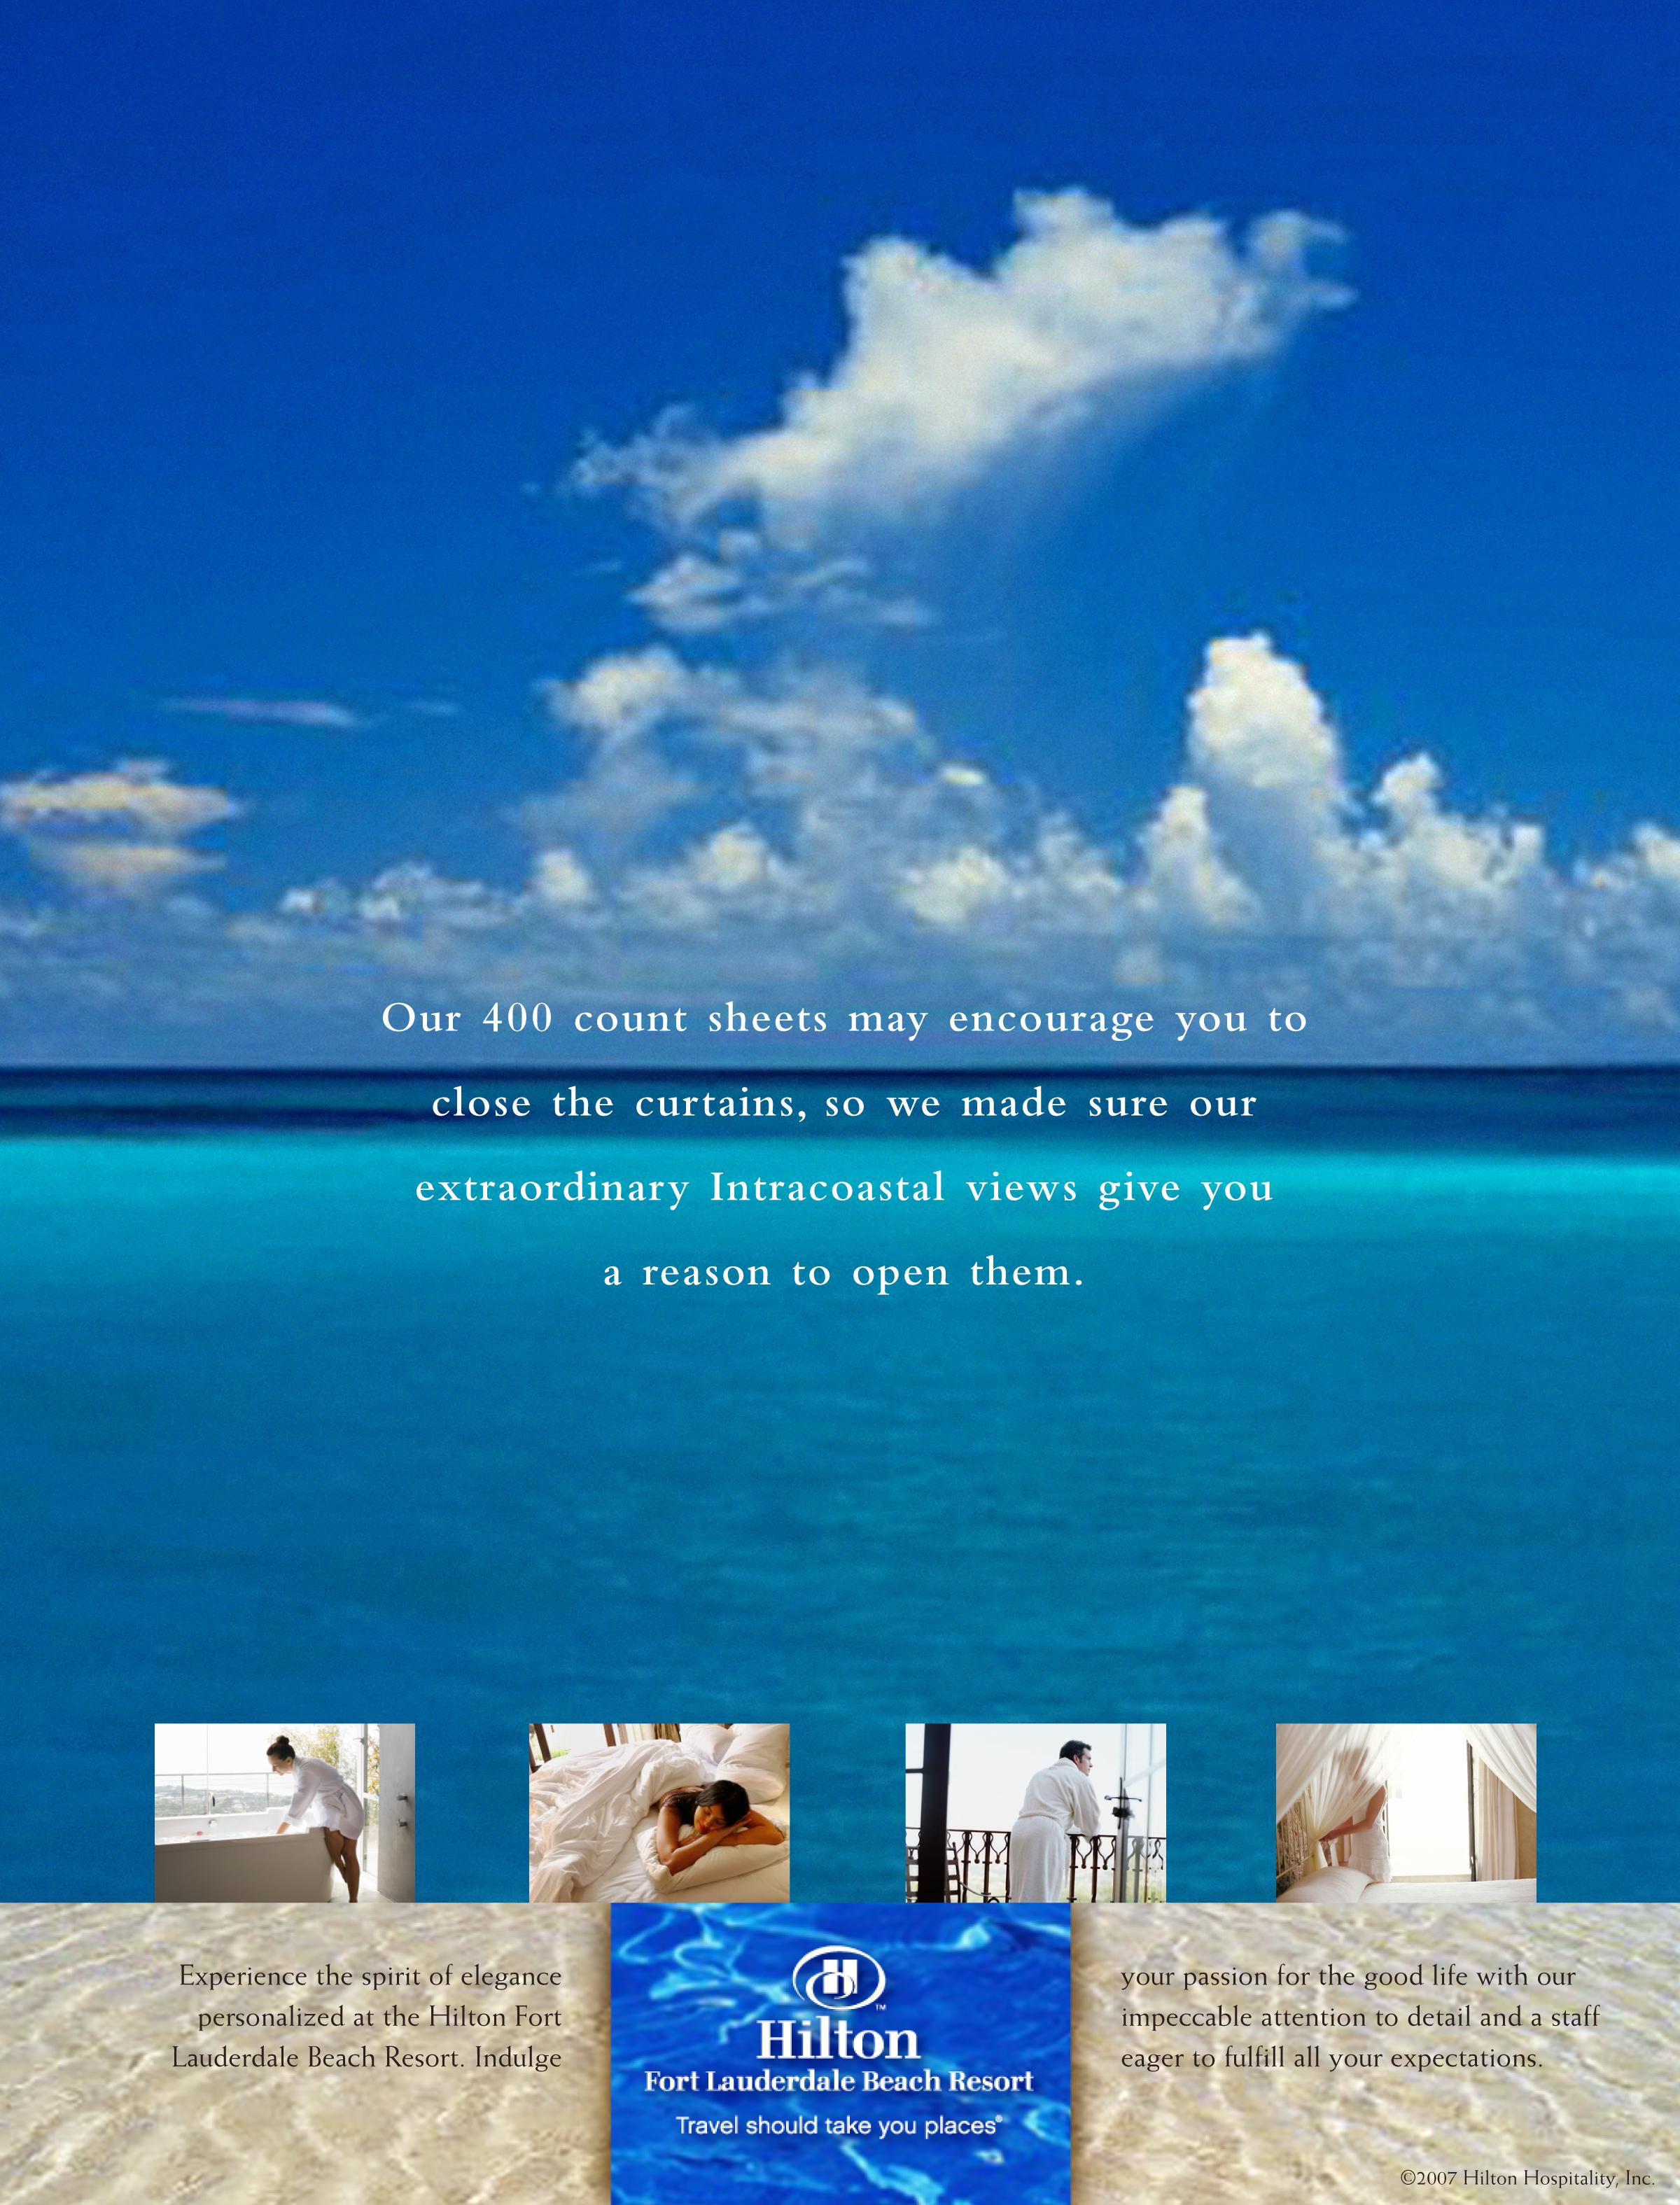 Hilton sheets ad.jpg